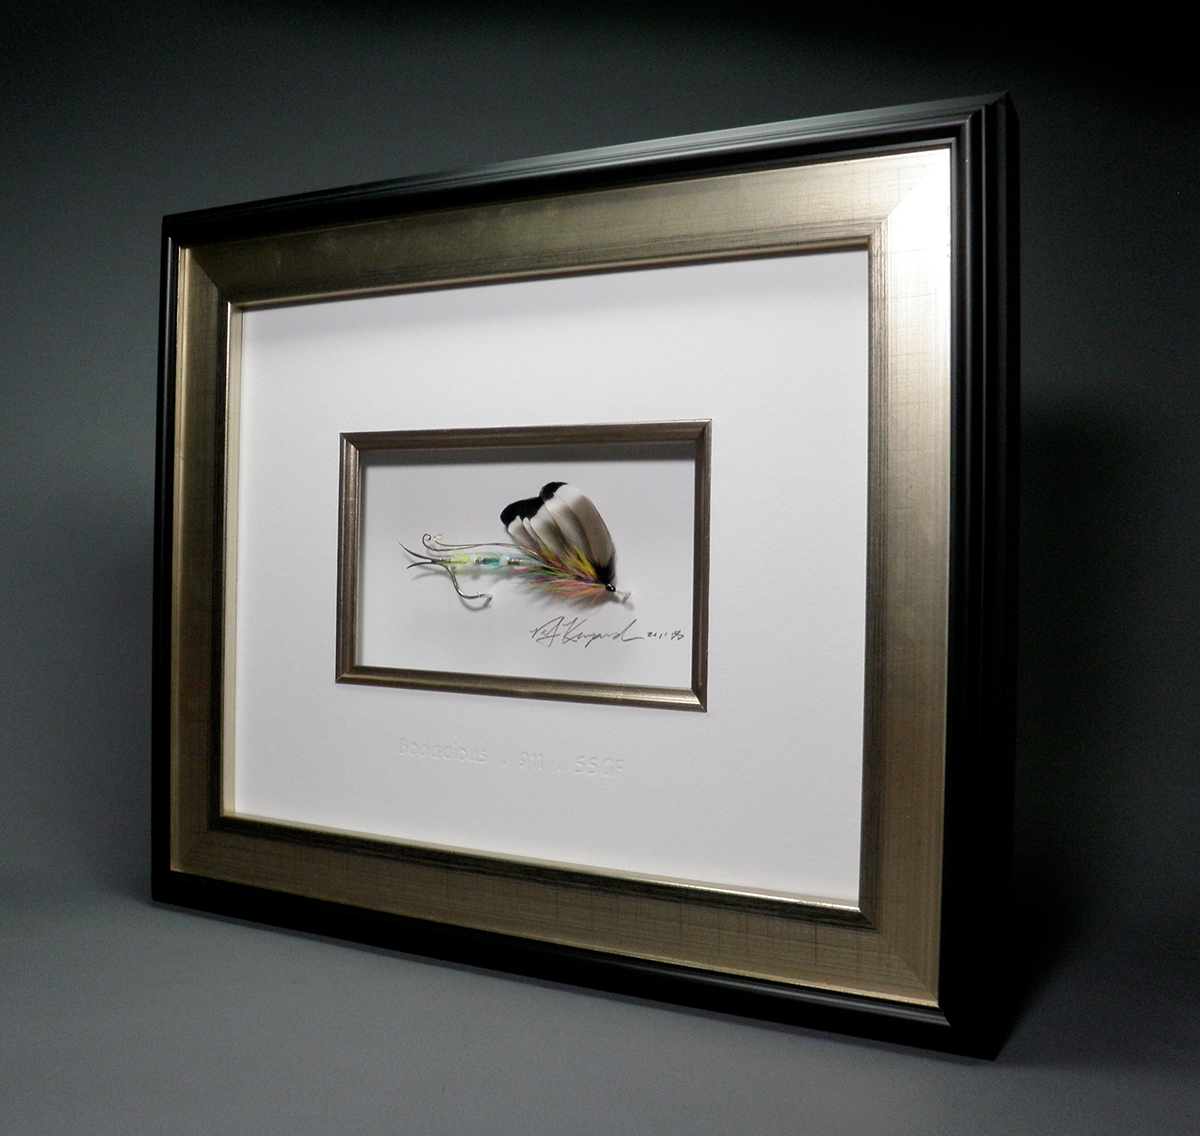 Bodacious Frame